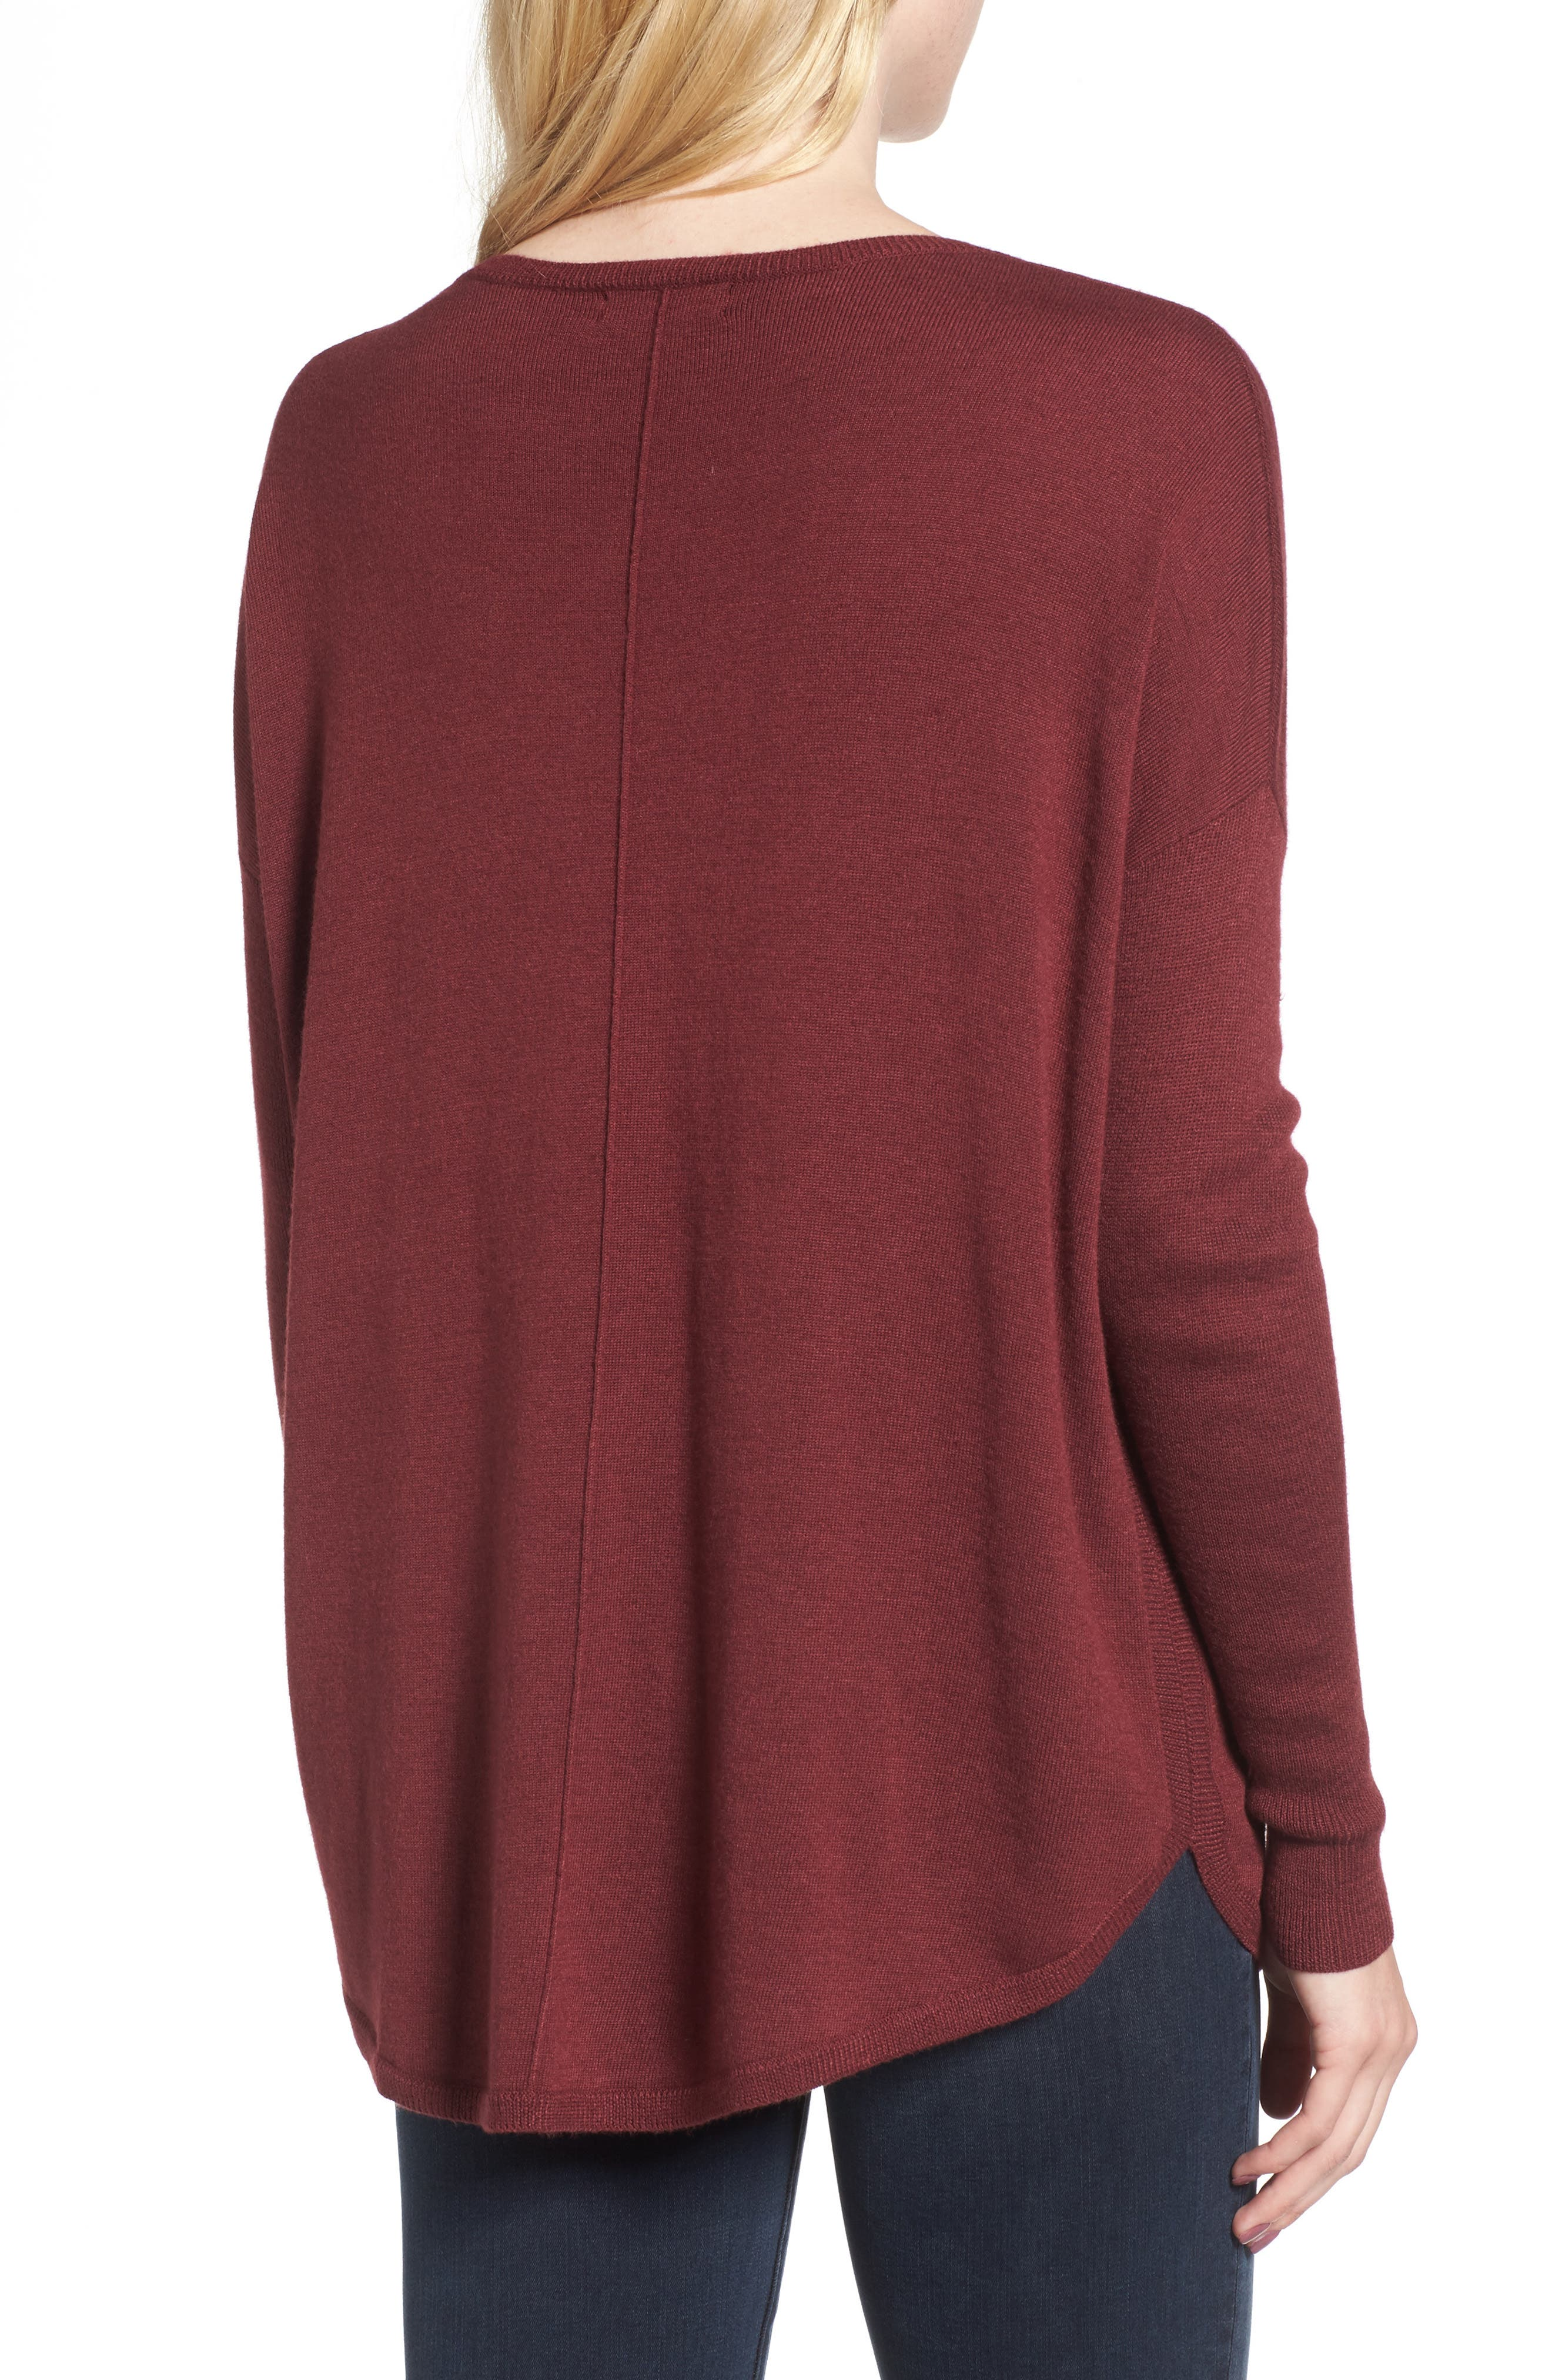 'Everyday' V-Neck Sweater,                             Alternate thumbnail 2, color,                             Burgundy London